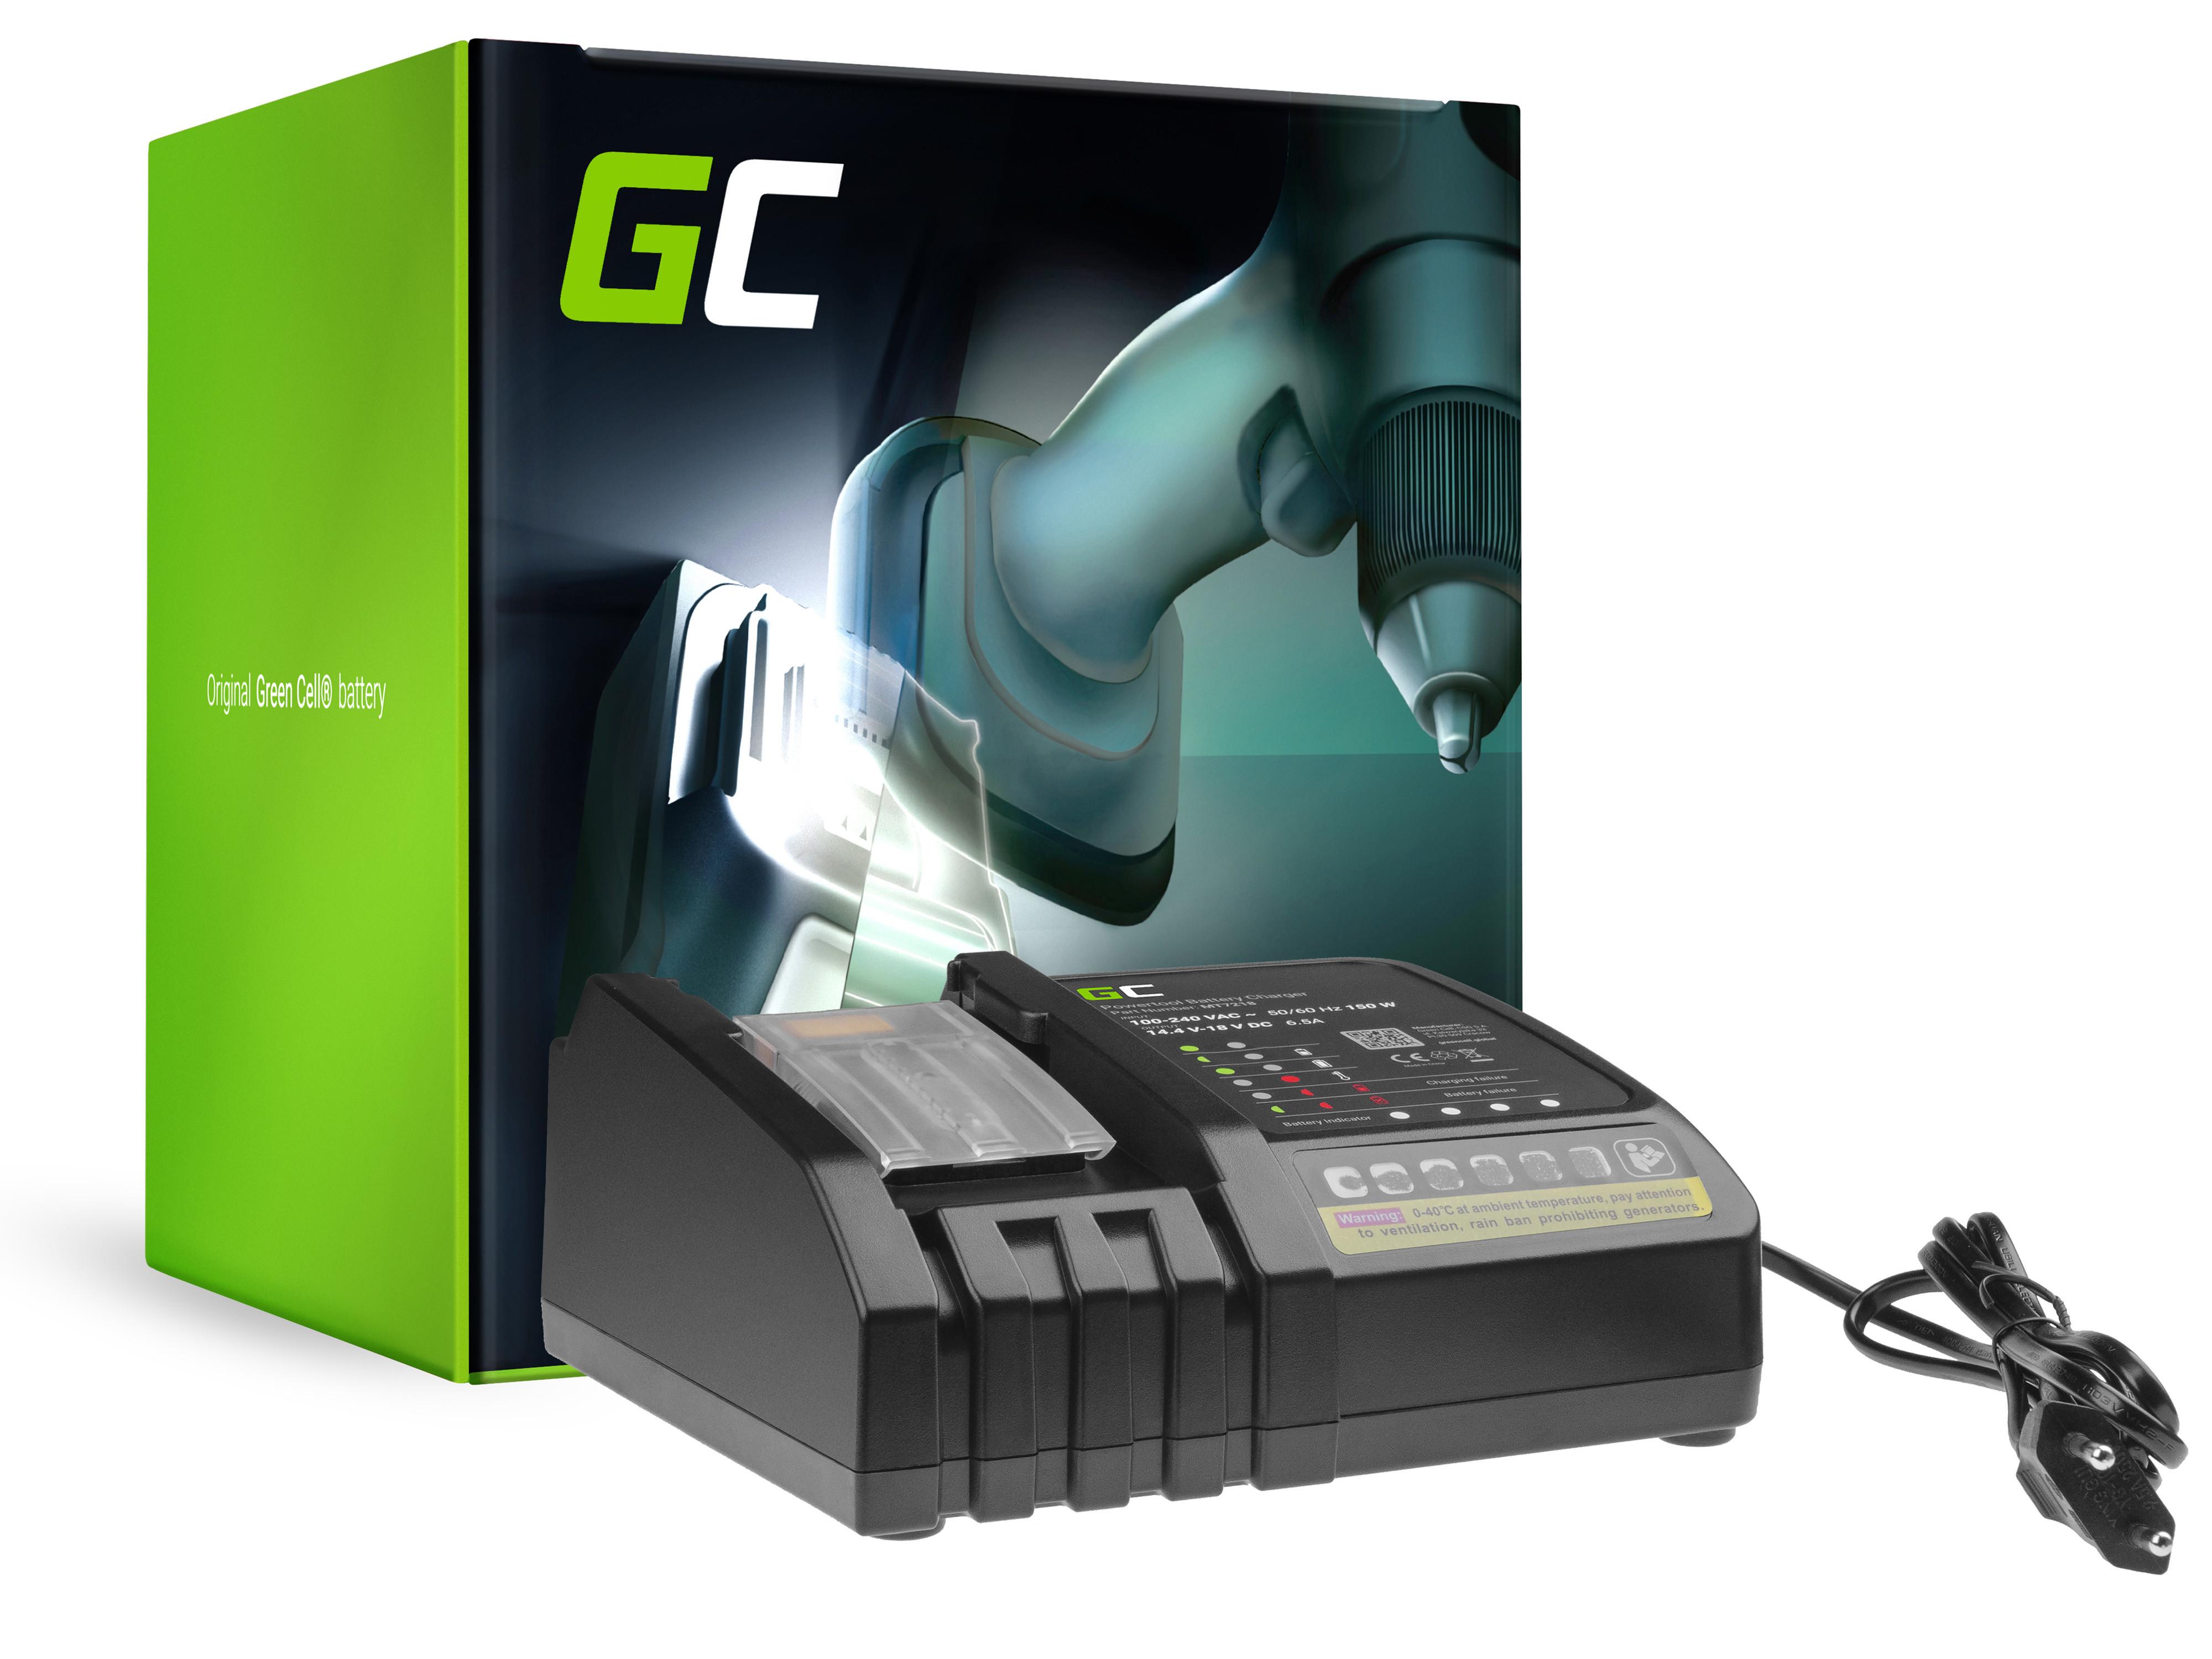 Power Tool Battery Charger SFC-7/18 for Hilti Ni-MH/Ni-CD SF120A SFB120 SFB123 SFB125 SID121 TCD12